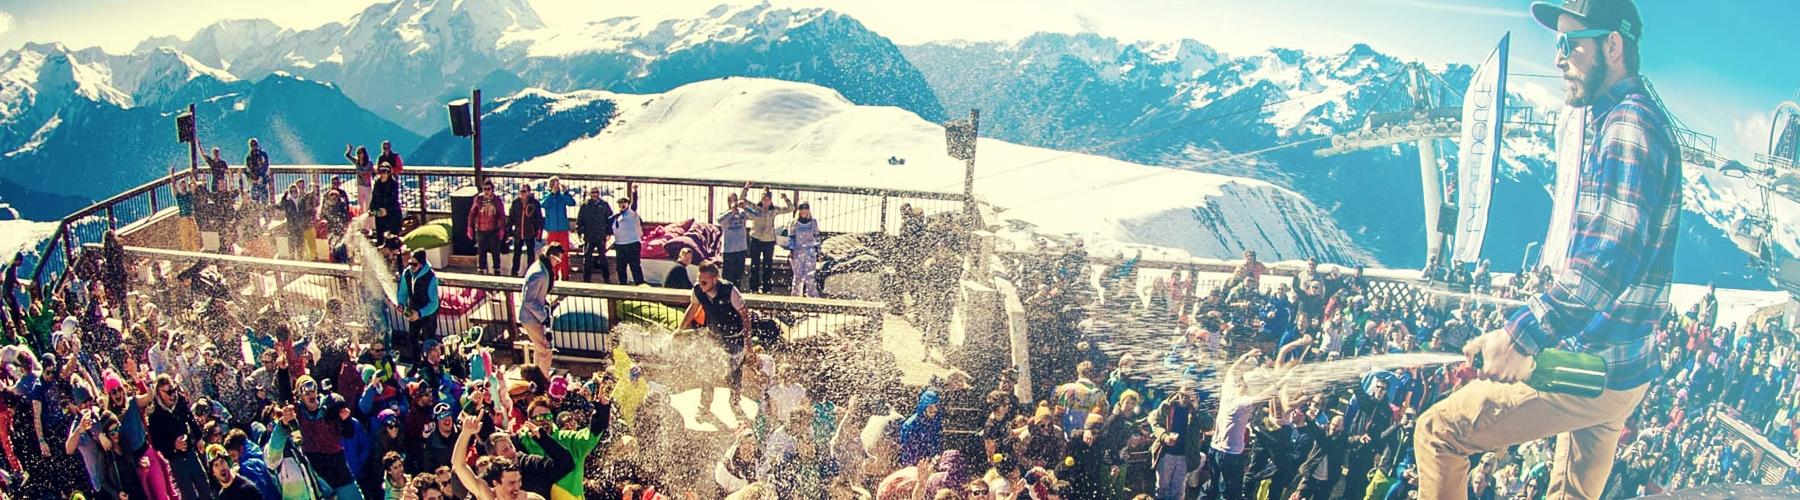 skihomepages_0007_Turquoise Haze